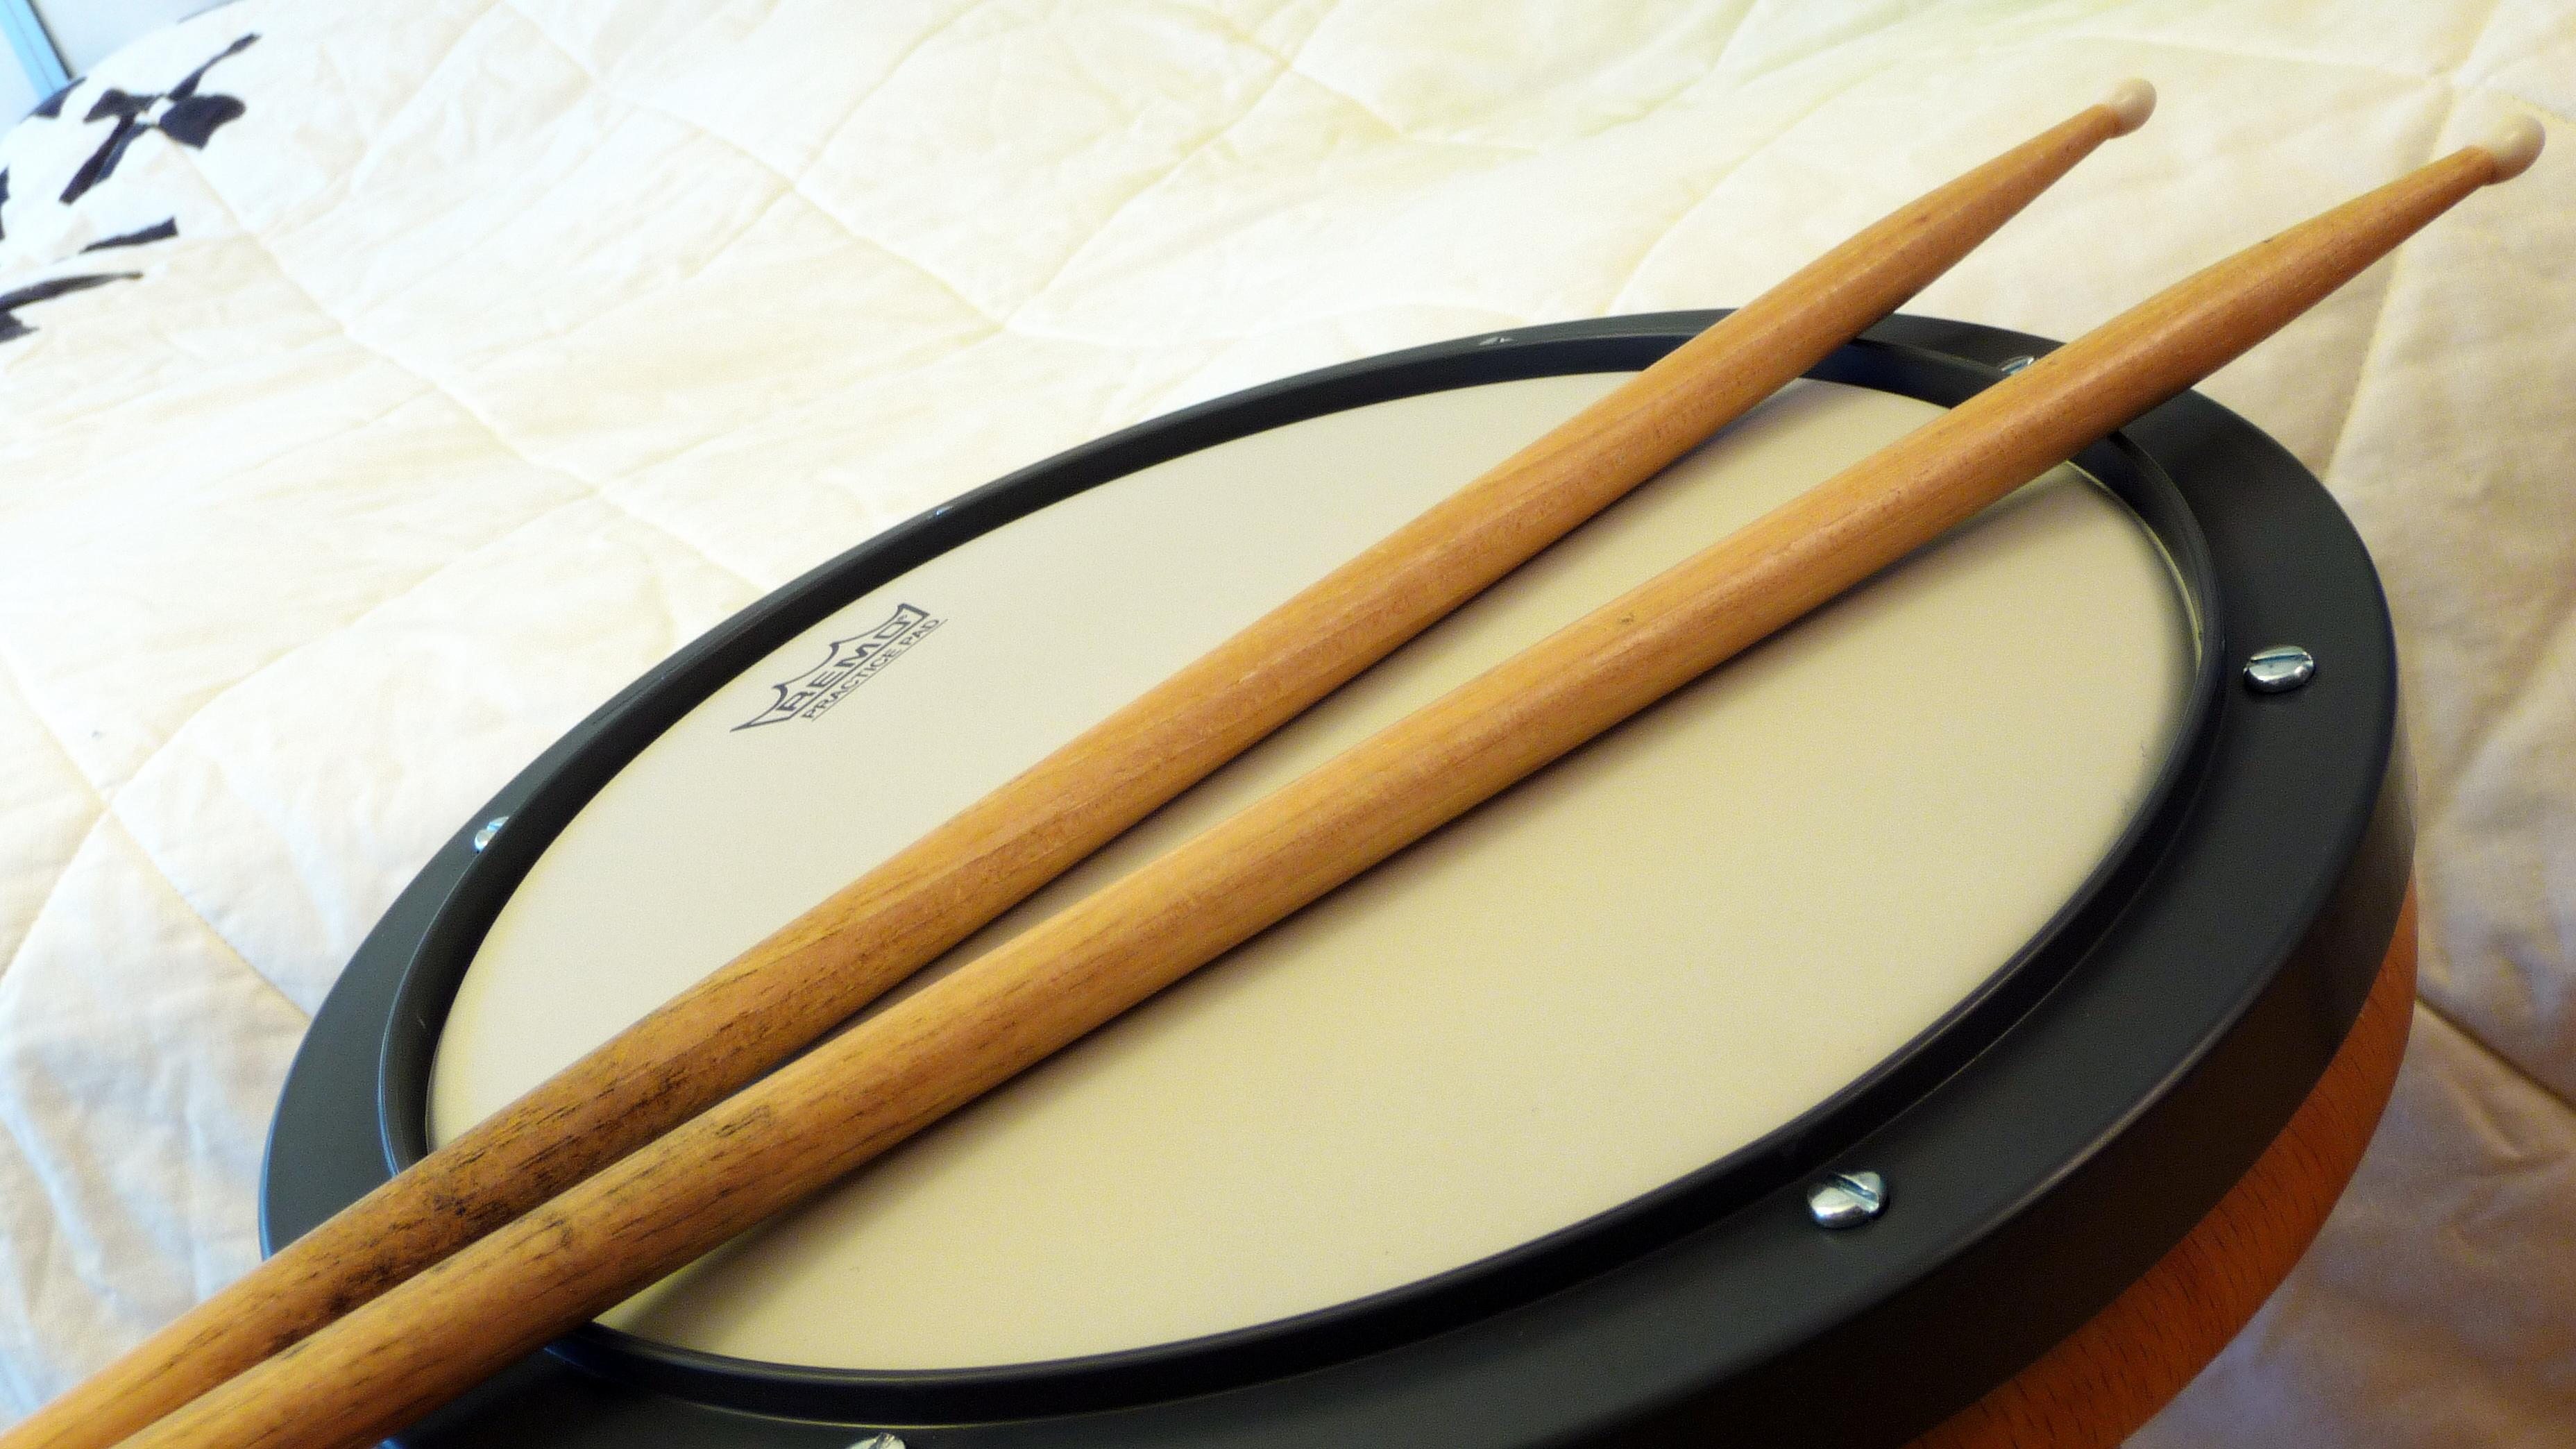 drumming practice pads